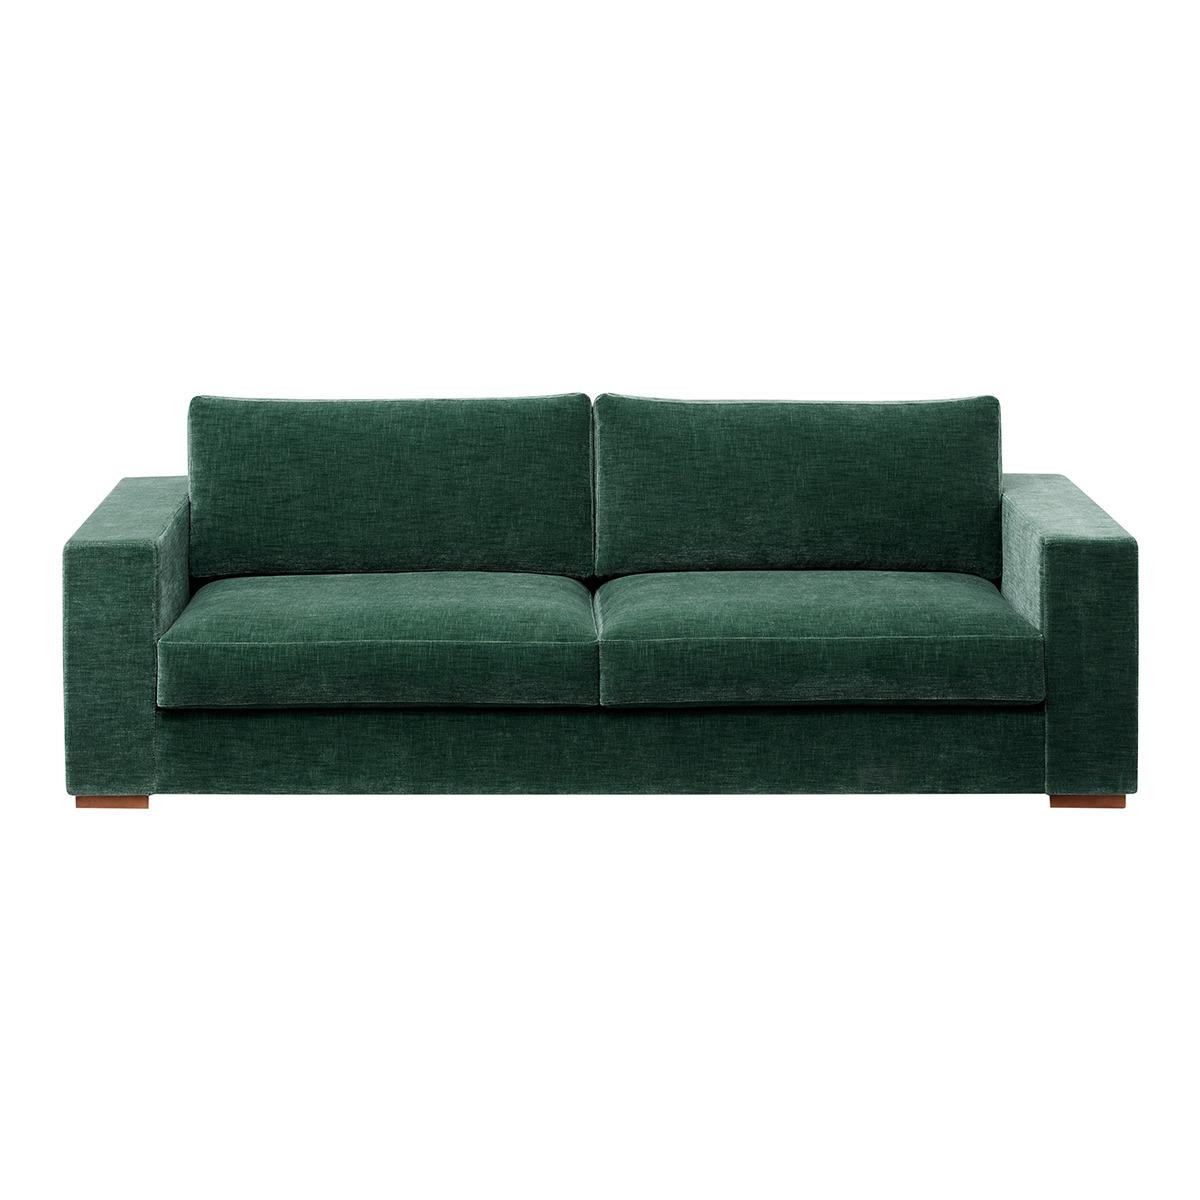 sofa verde pistacho cool verde pistacho en contraste con